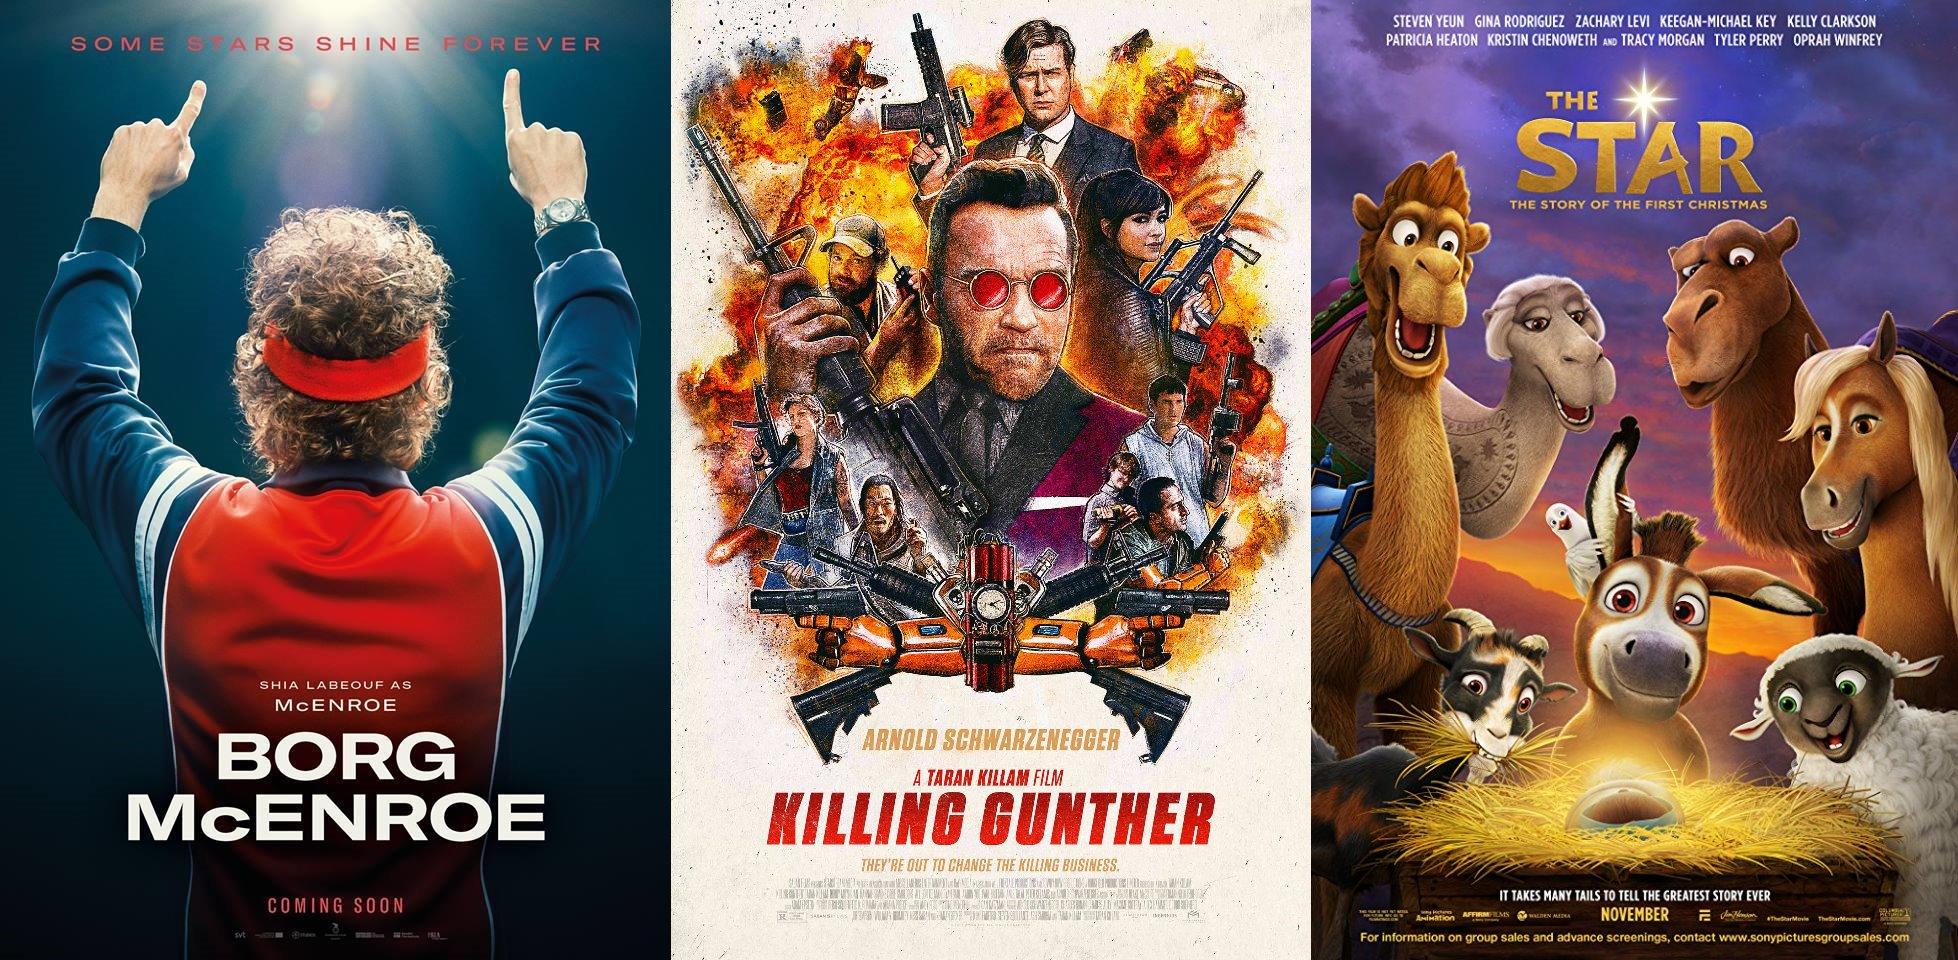 Trailer-Watchin' Wednesday: Borg vs. McEnroe, The Star, Killing Gunther